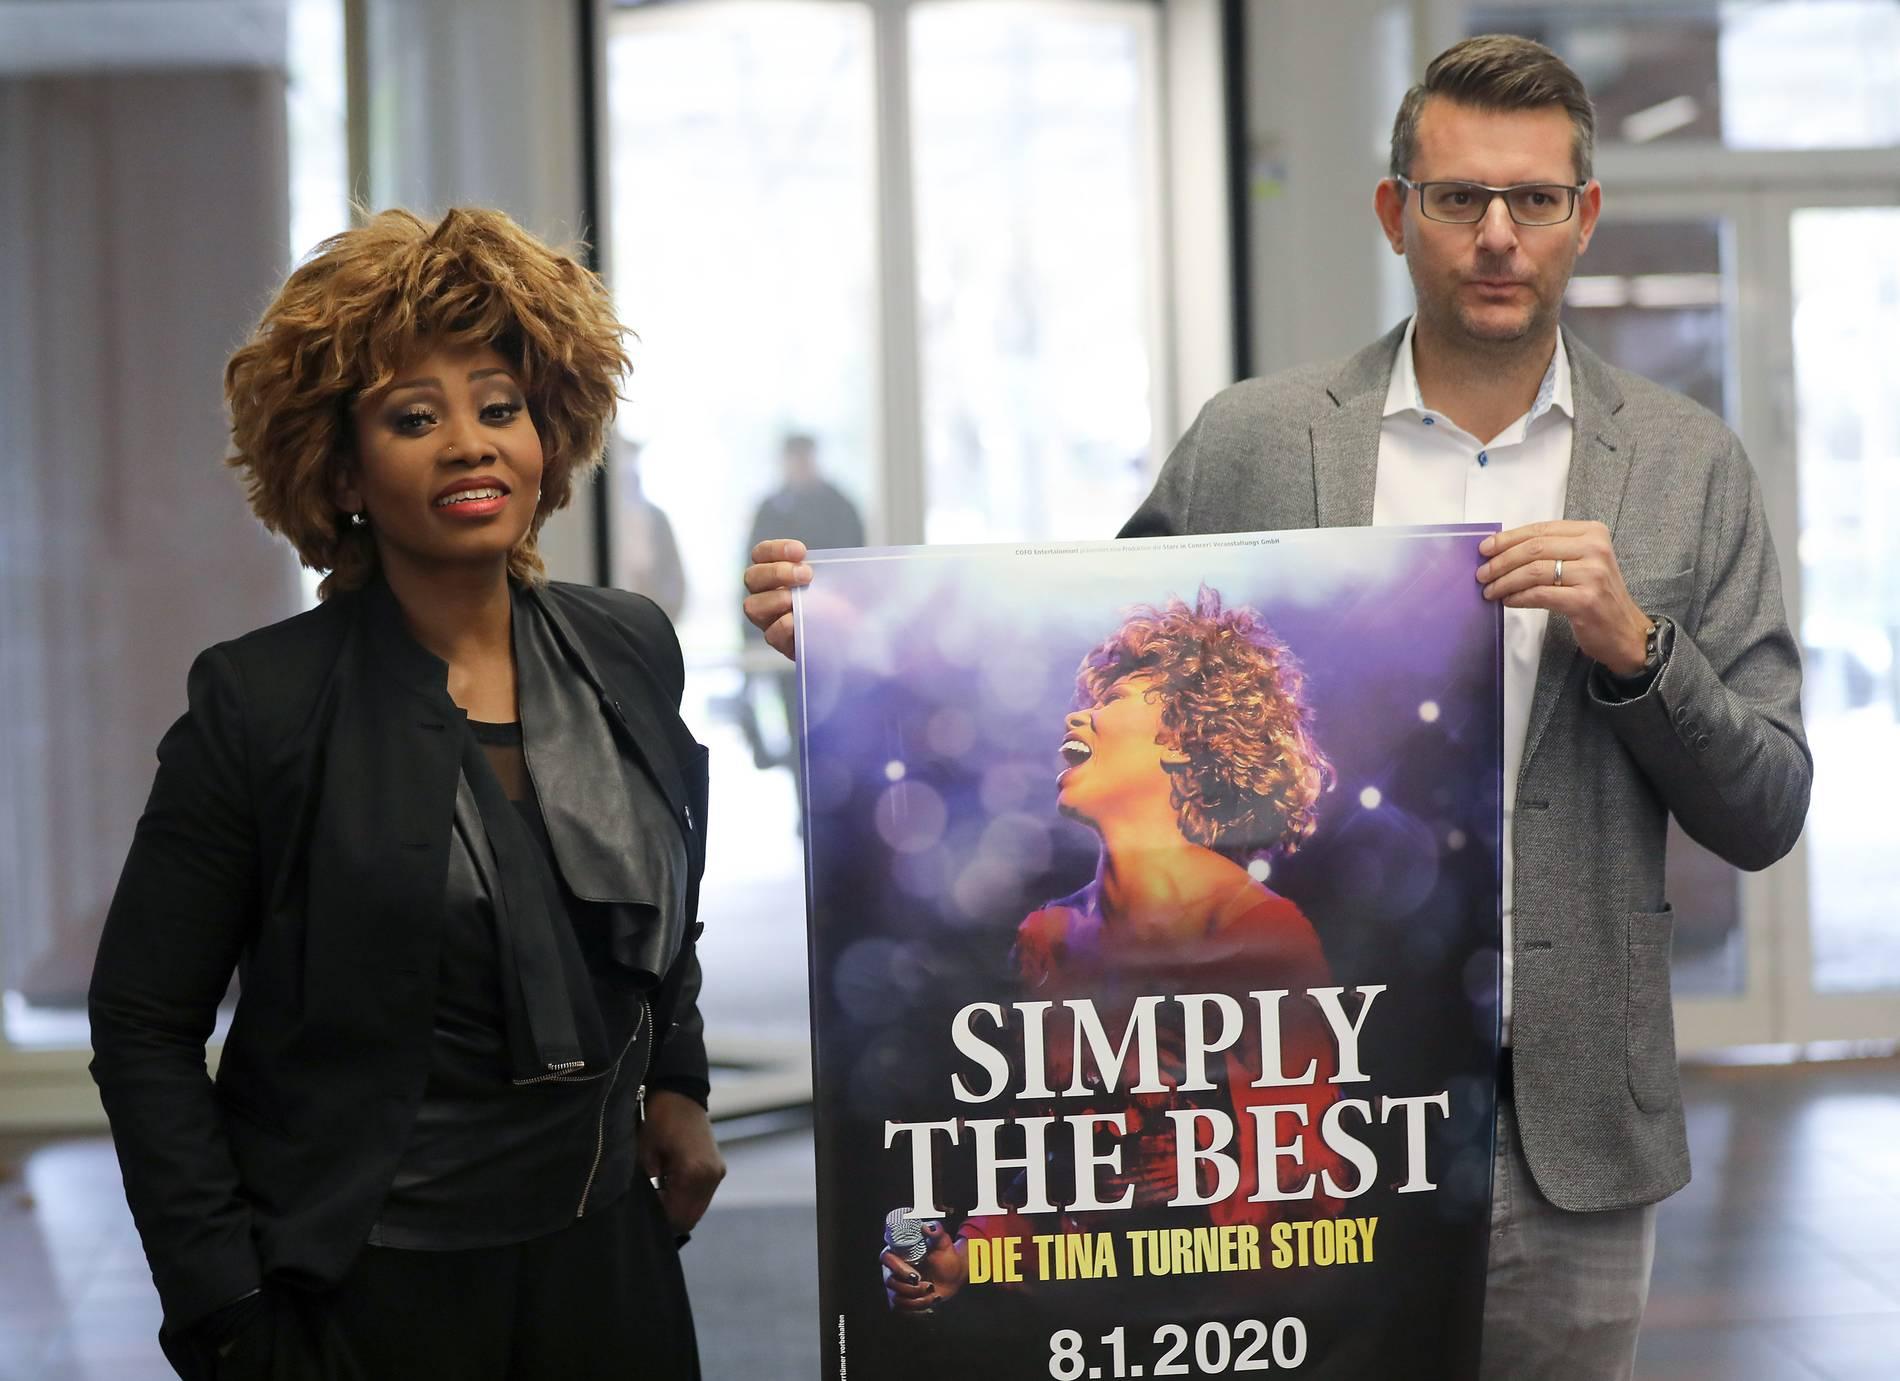 Leute - Gericht verbietet Tina-Turner-Plakat